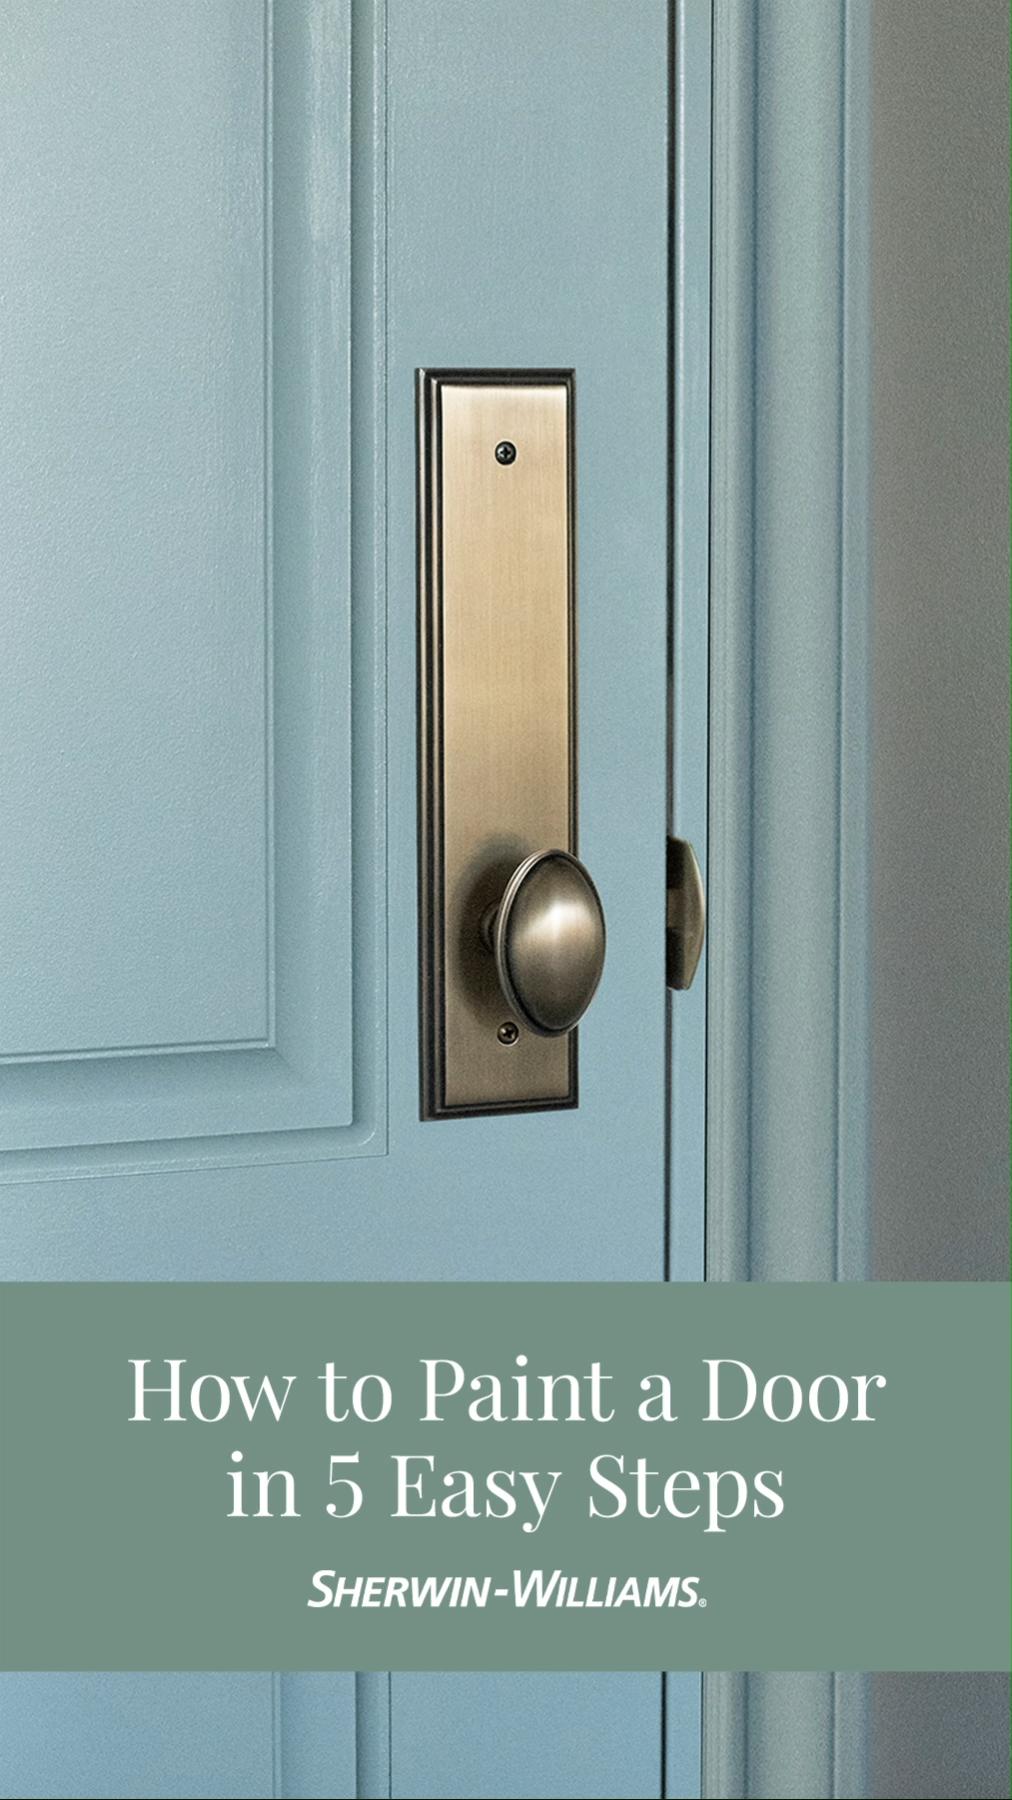 How to Paint a Door in Five Easy Steps